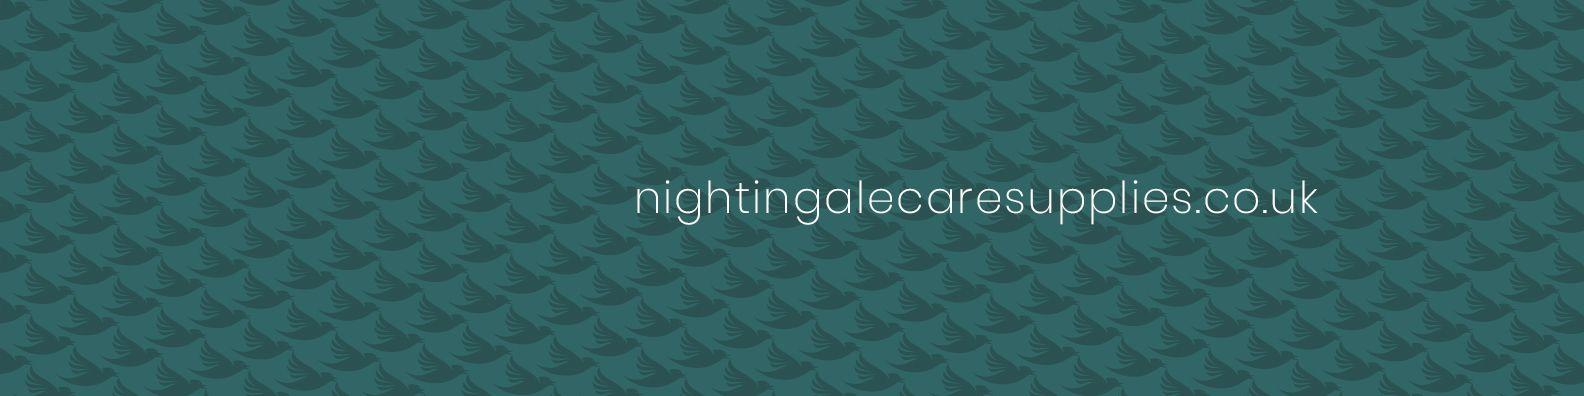 Nightingale Care Supplies